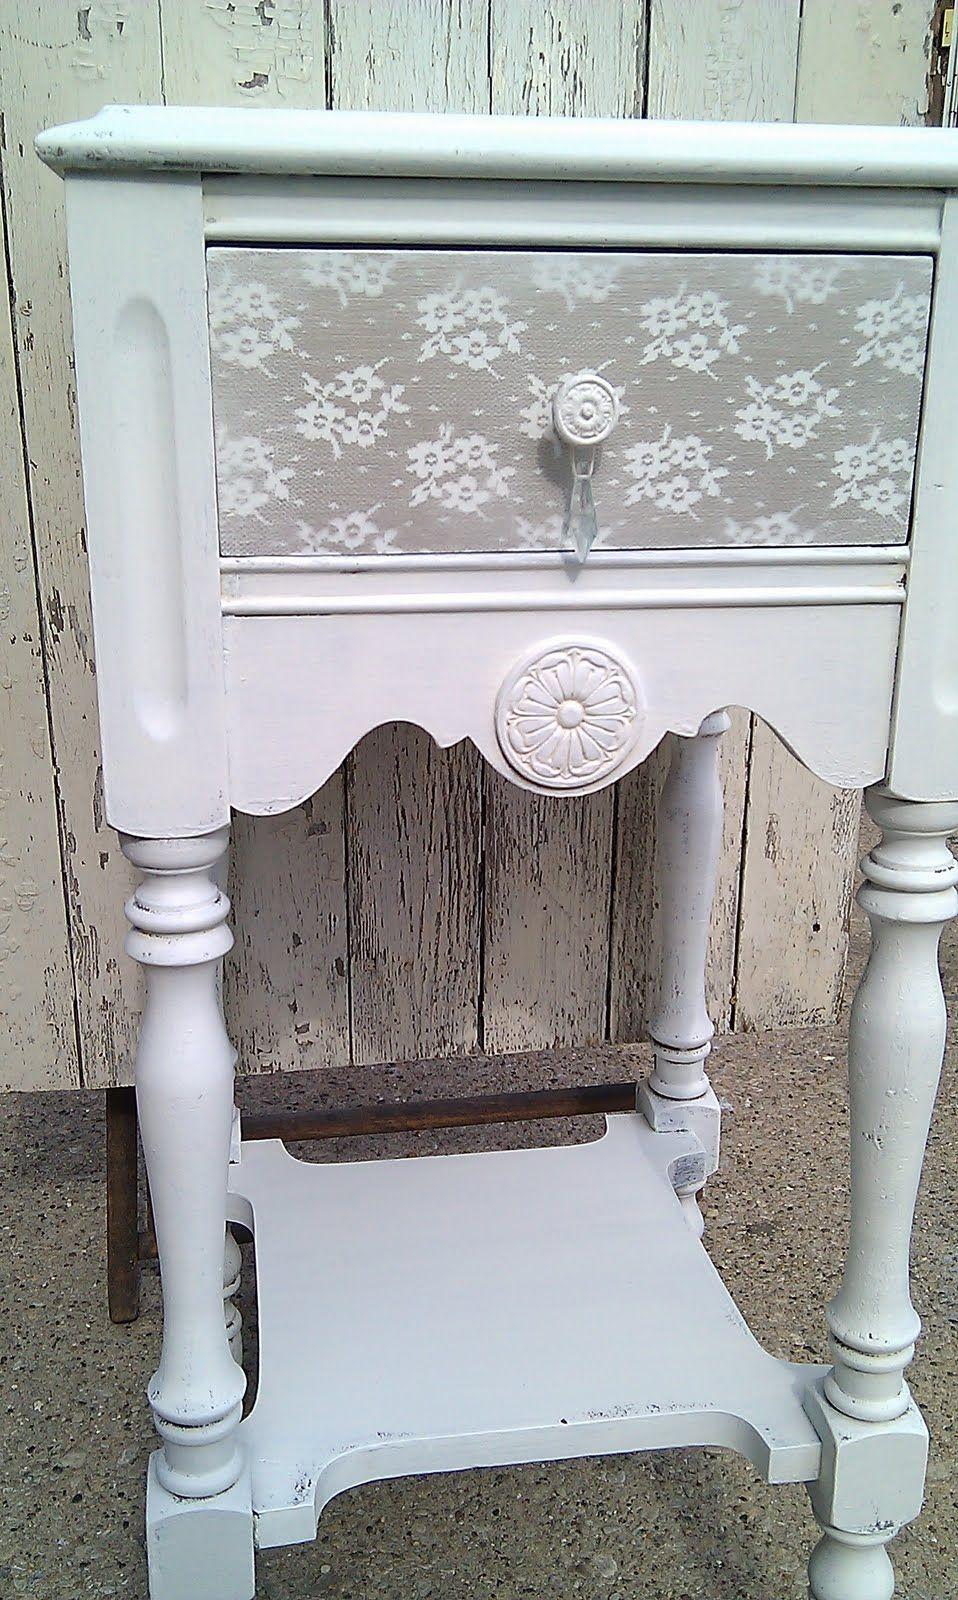 you can spray paint over lace malen und lackieren paintingtips pinterest bastelanleitungen. Black Bedroom Furniture Sets. Home Design Ideas